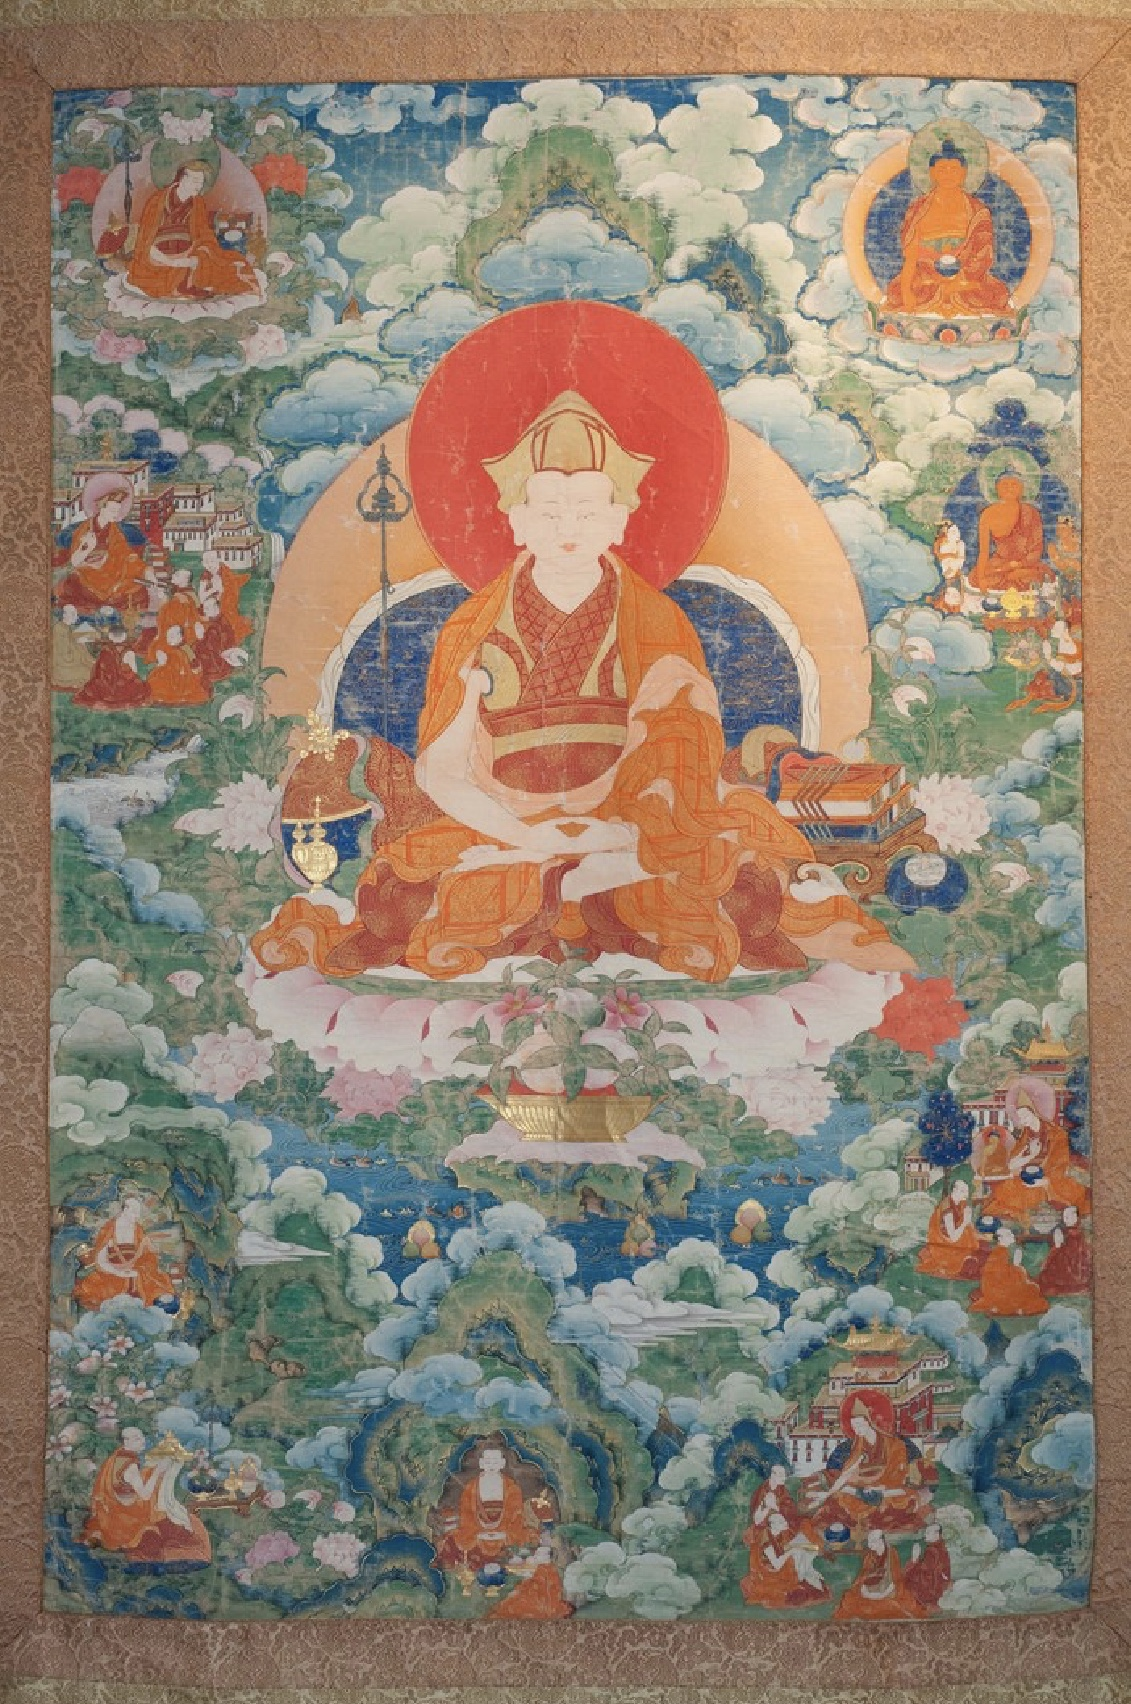 DrubchenChokyiDorje.(Photo© 2018 Himalayan Art Resources Inc. Photographed Image Copyright © 2004 Rubin Museum of Art)